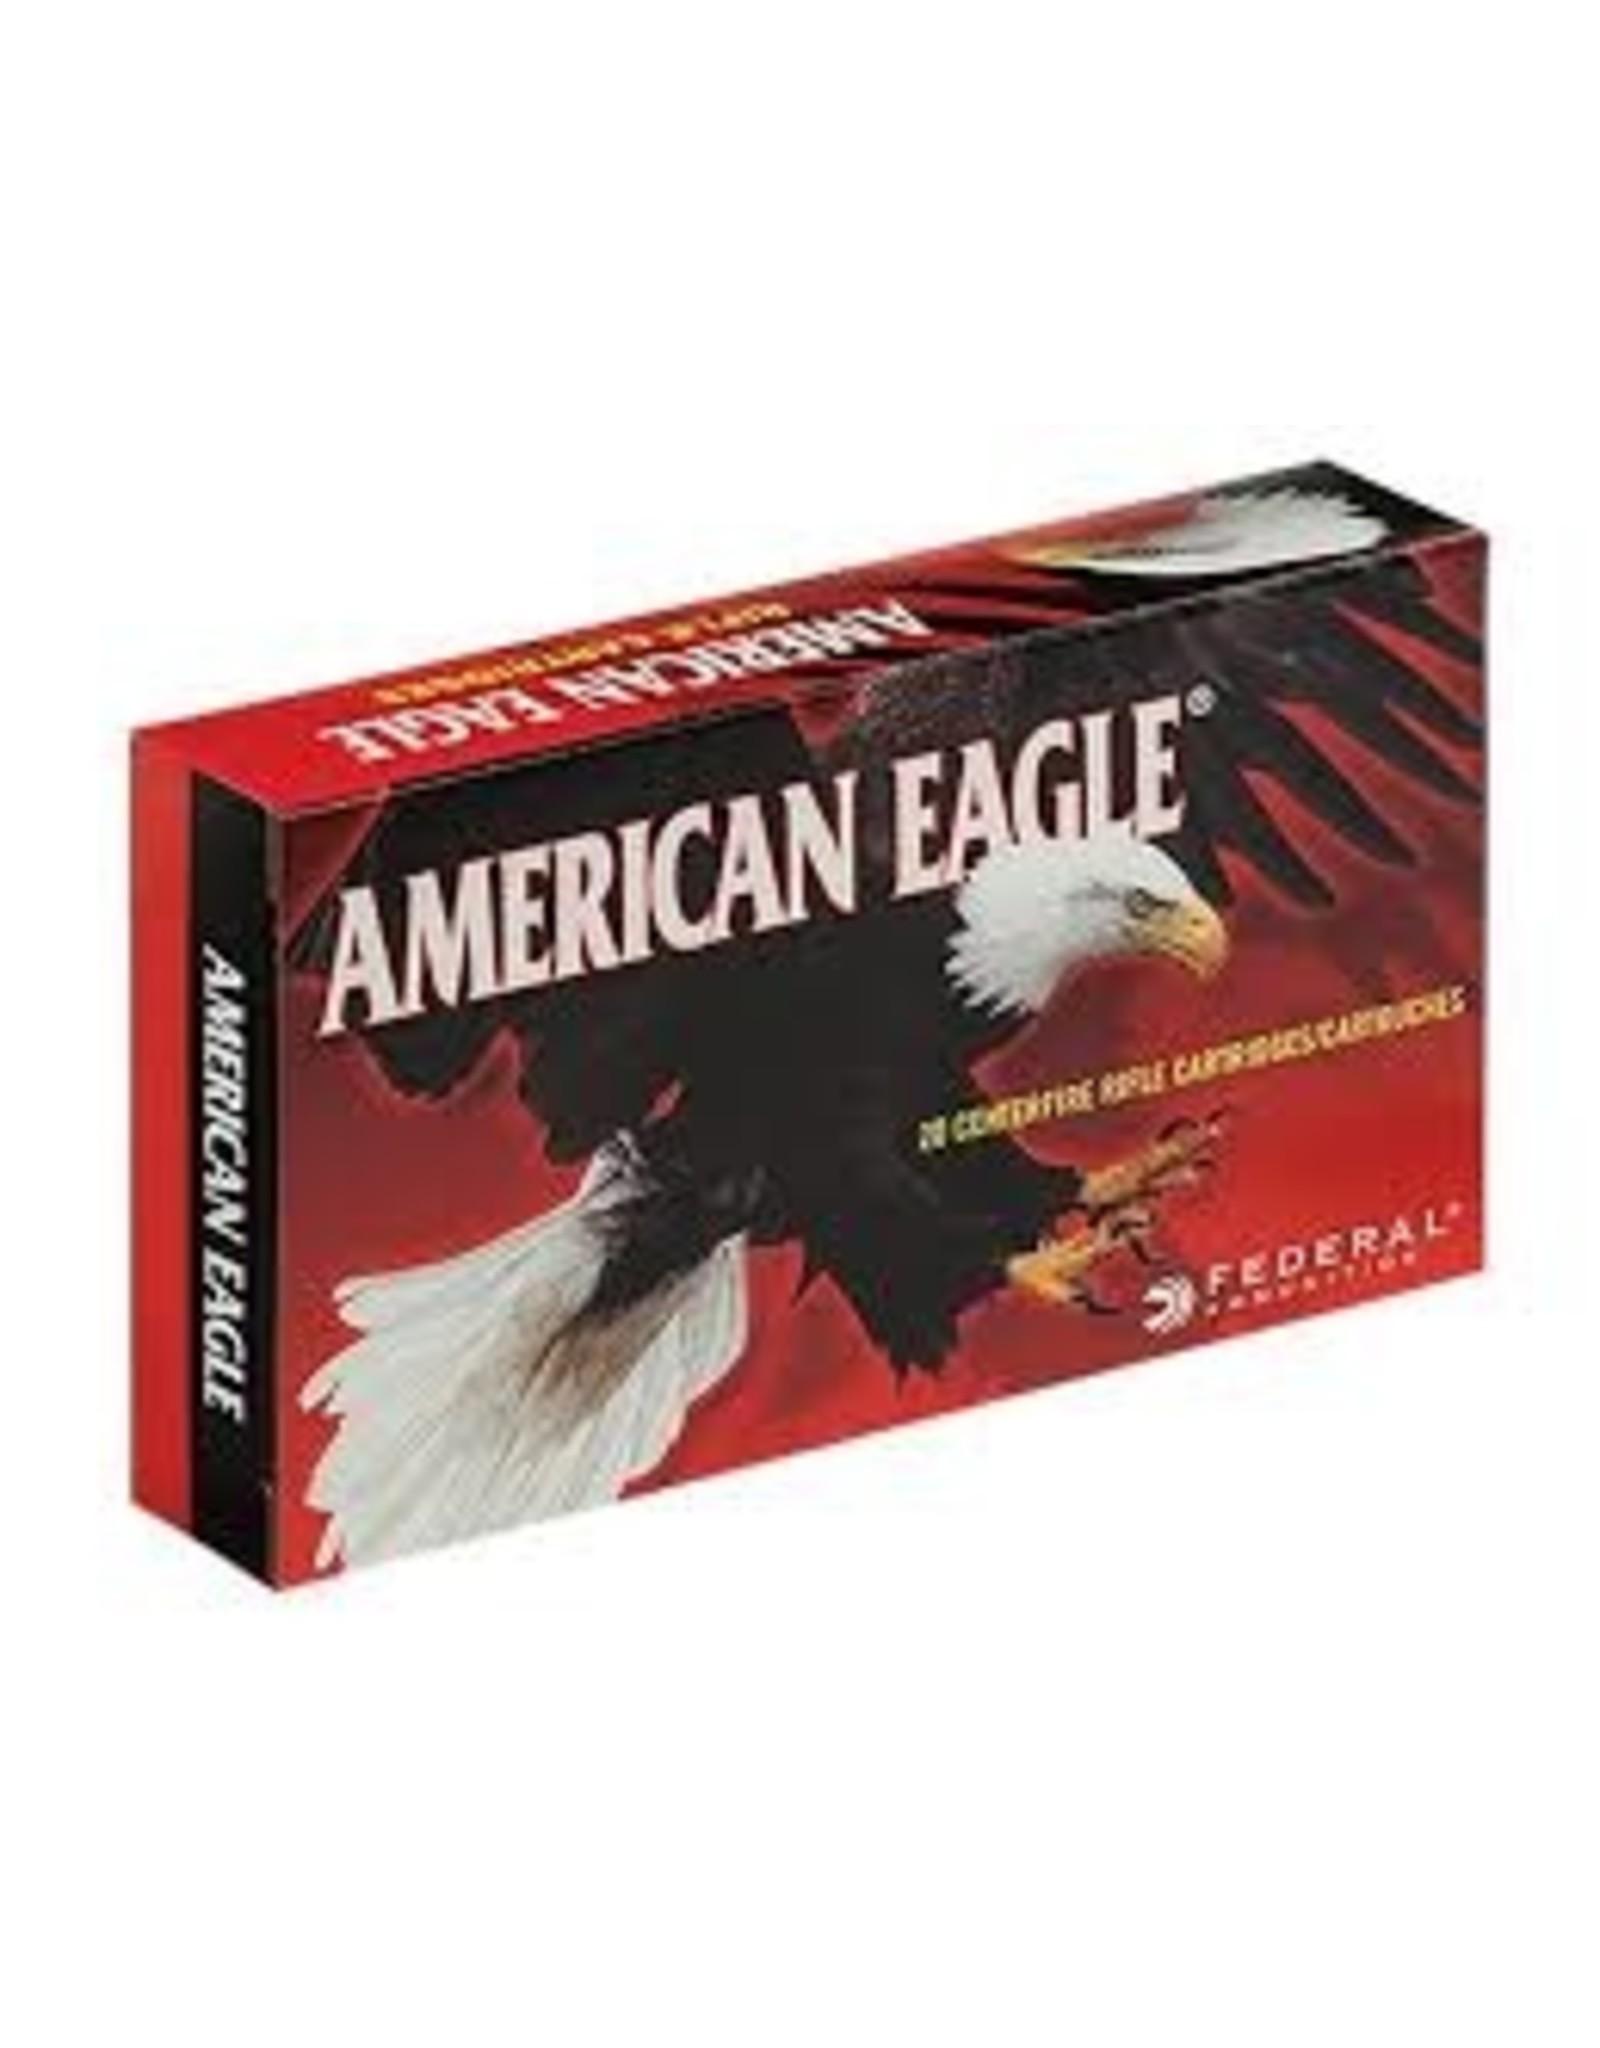 American Eagle American Eagle 338 Lapua 250GR